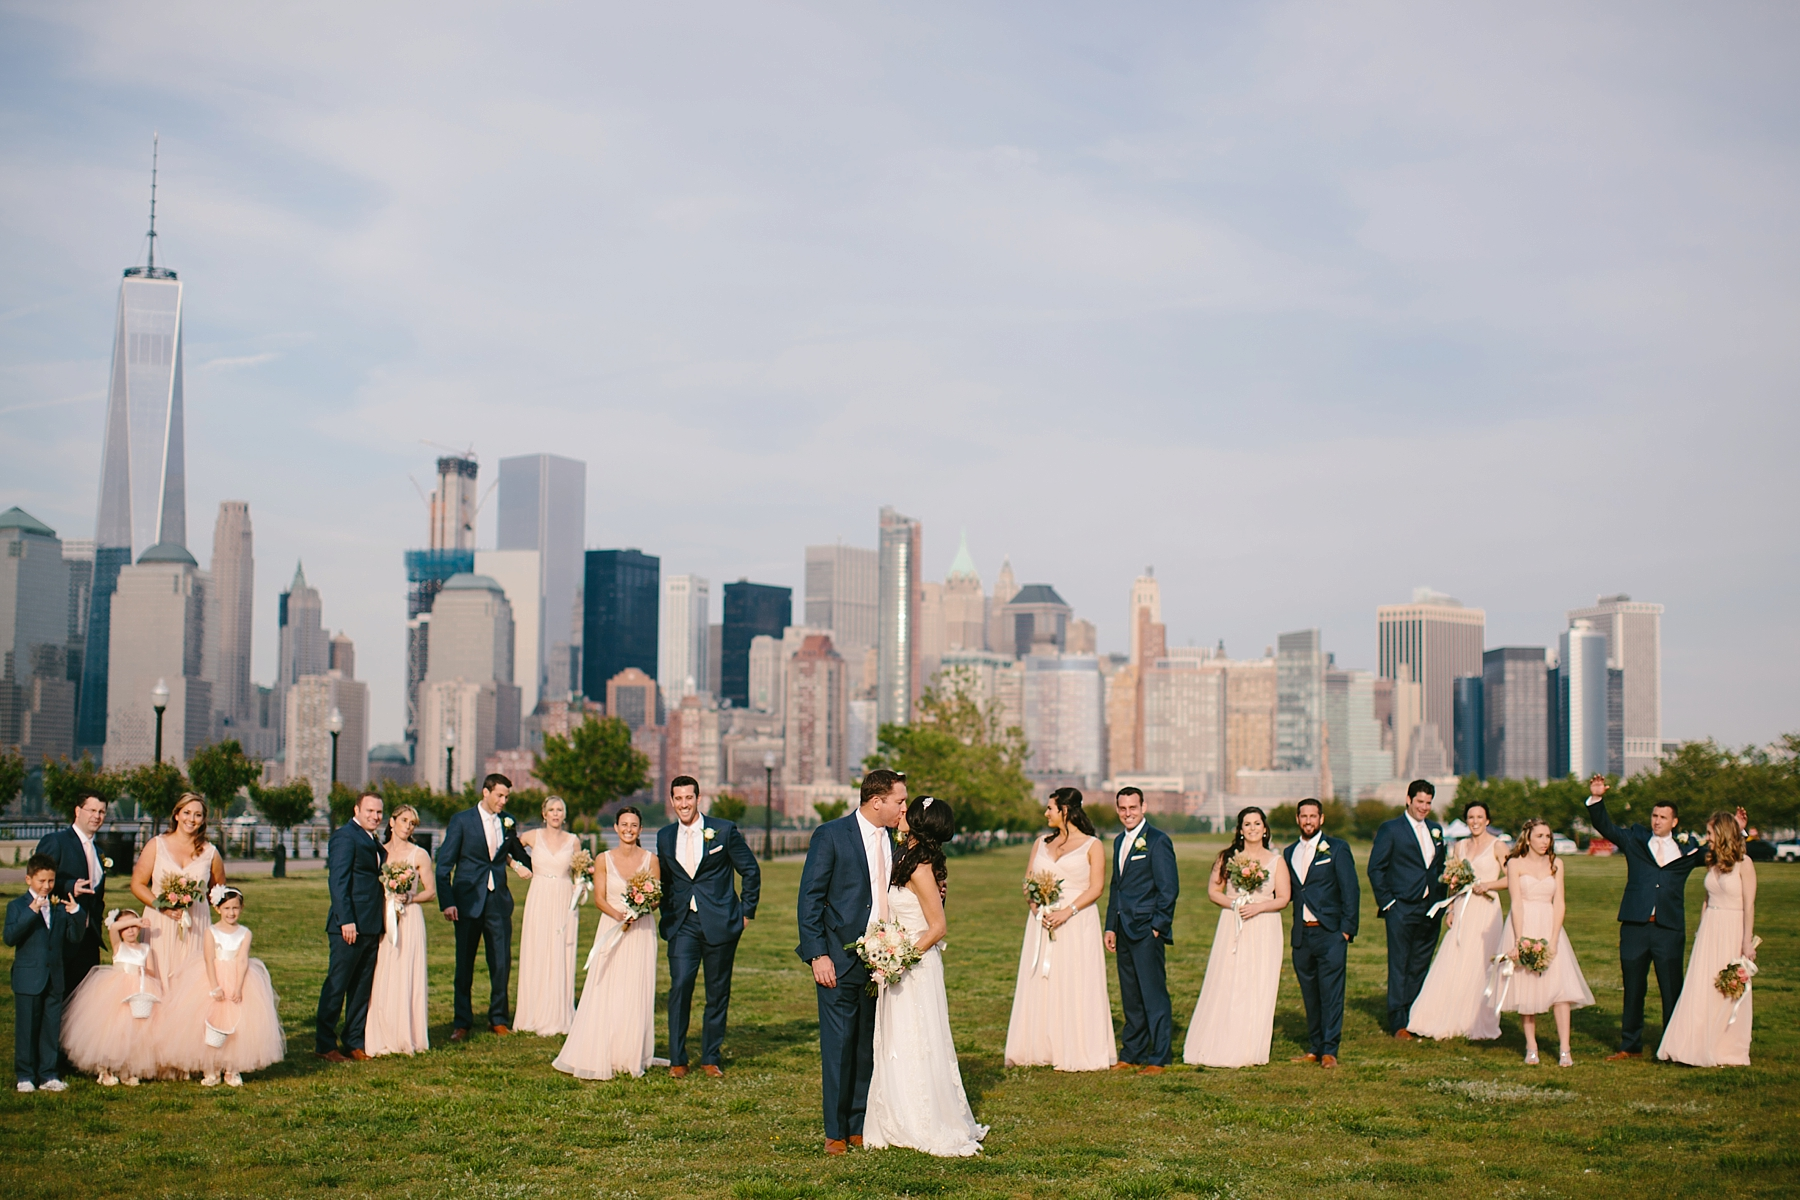 liberty-state-park-wedding-photographer-ny-nj_0028.jpg